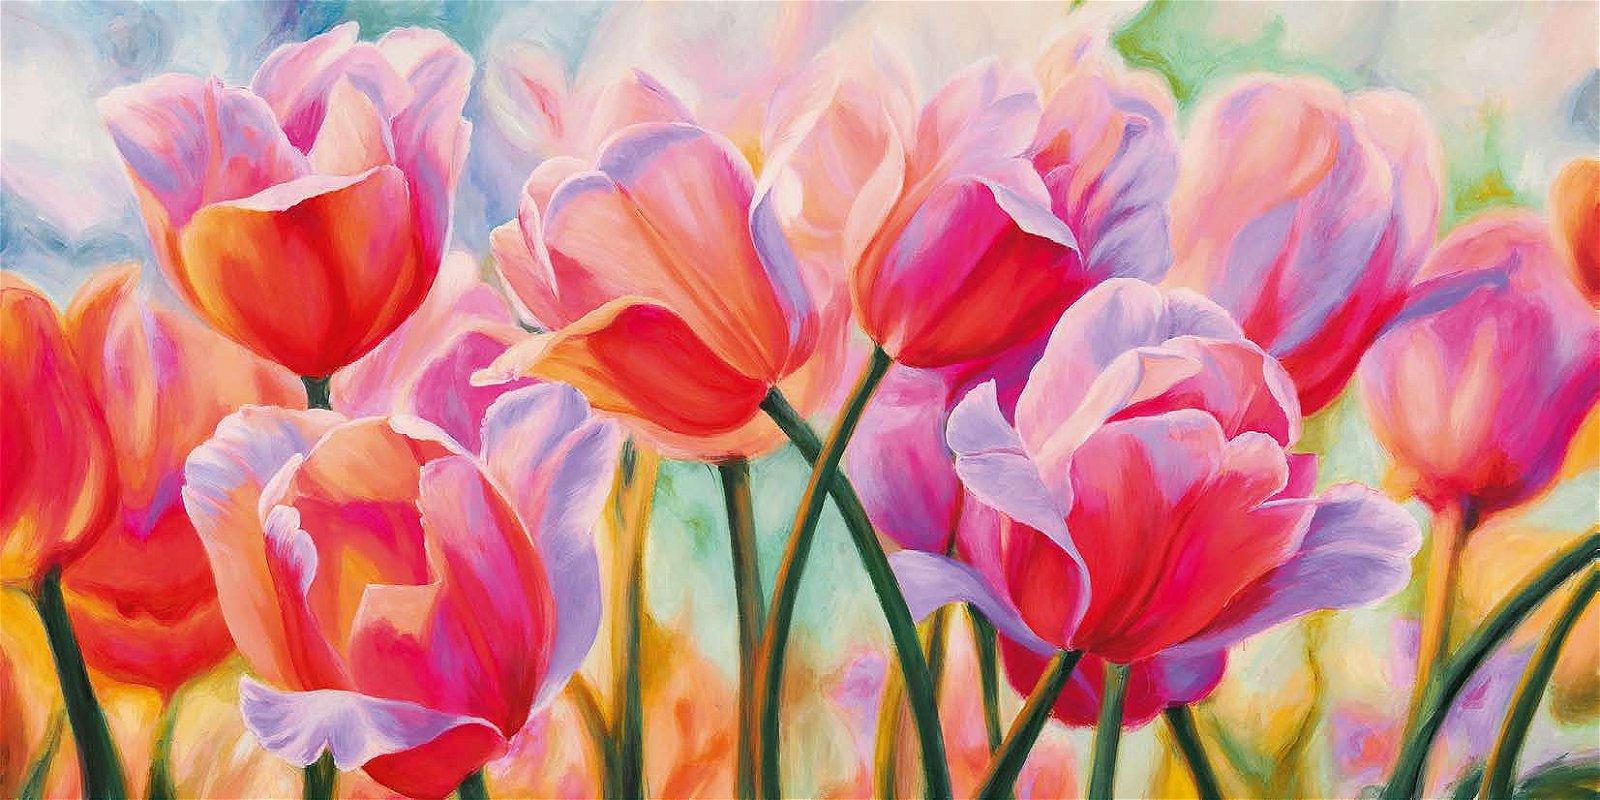 Cuadro canvas tulips in wonderland